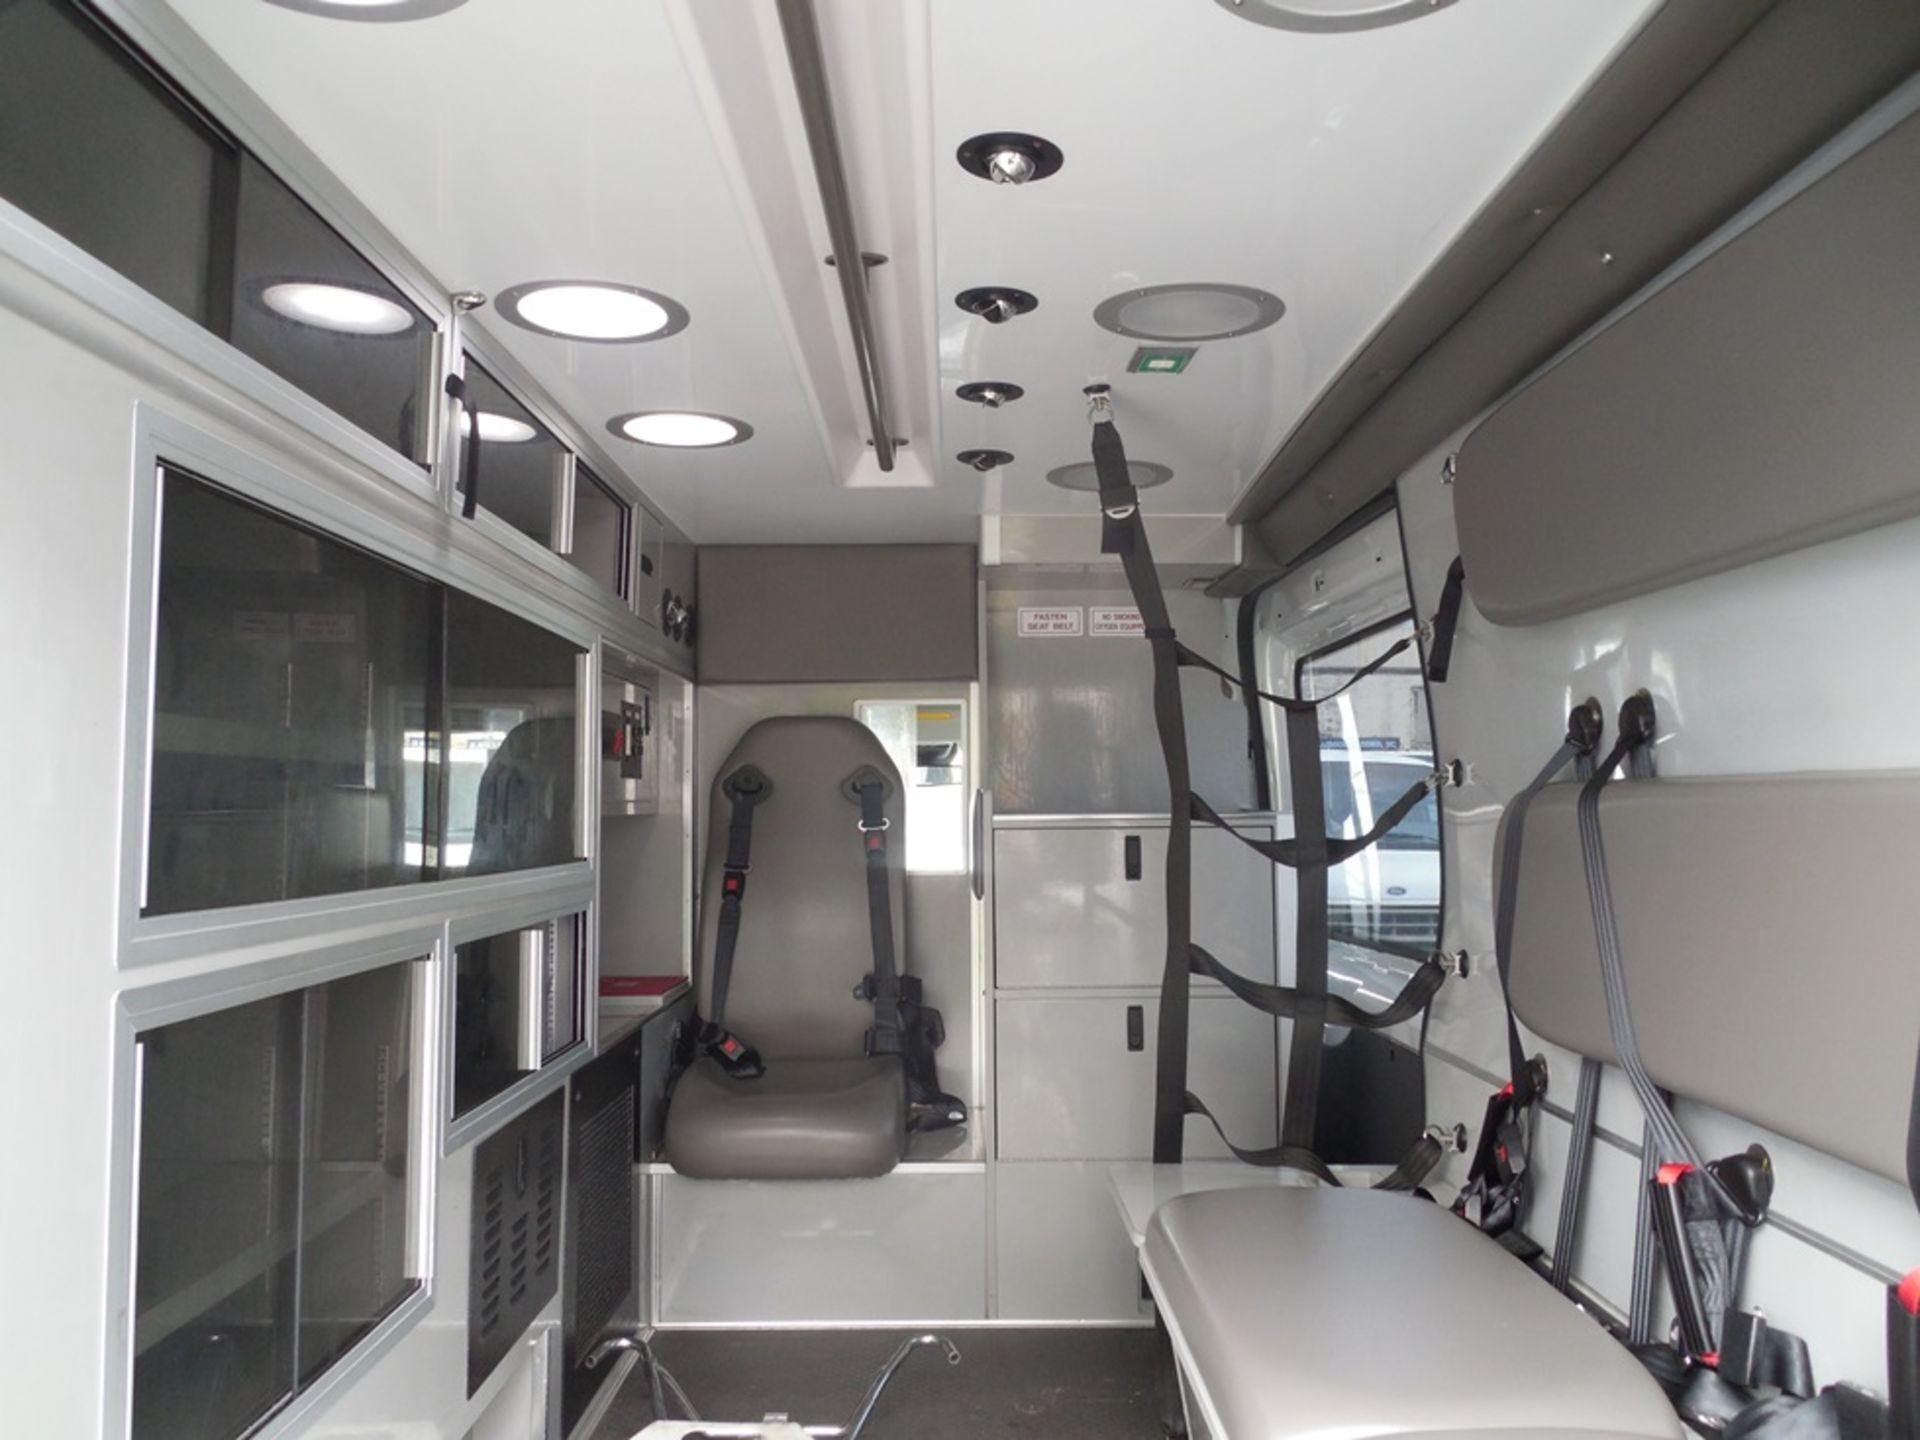 2017 Ford Tansit 250 dsl ambulance 165,029 miles vin# 1FDYR2CV0HKA57712 - Image 6 of 6